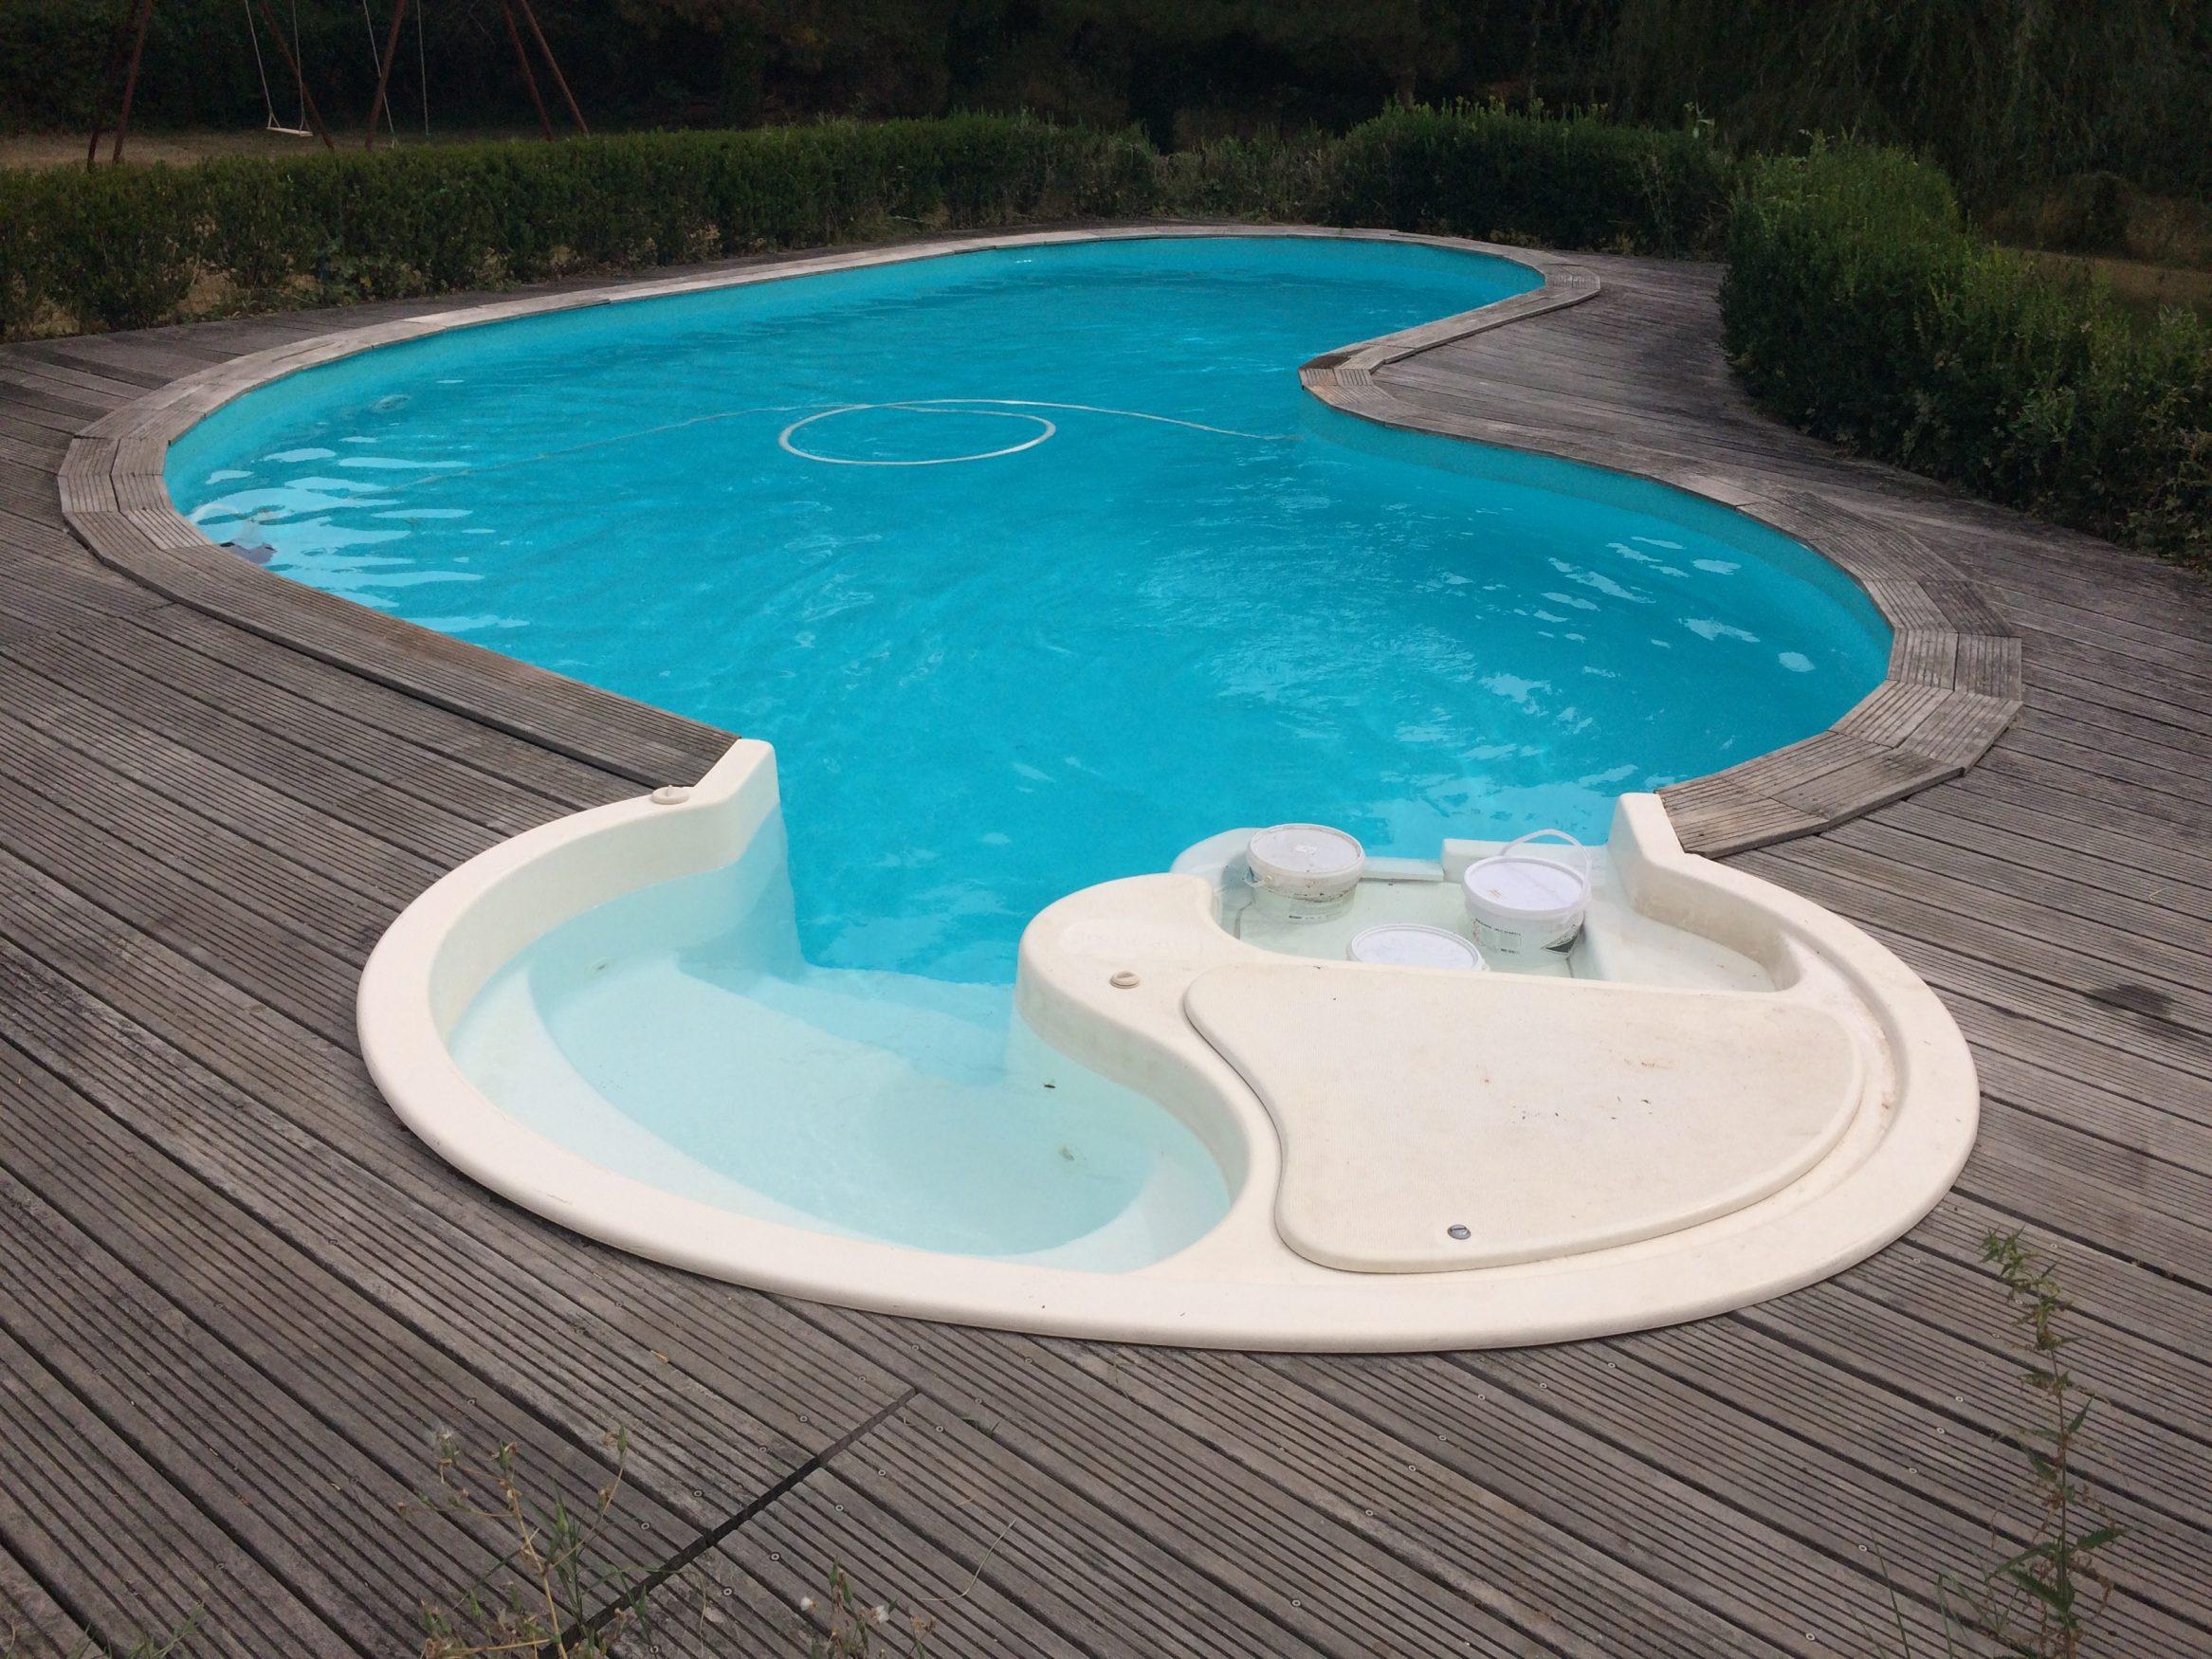 guilhem piscines construction et r novation de piscine montauban. Black Bedroom Furniture Sets. Home Design Ideas